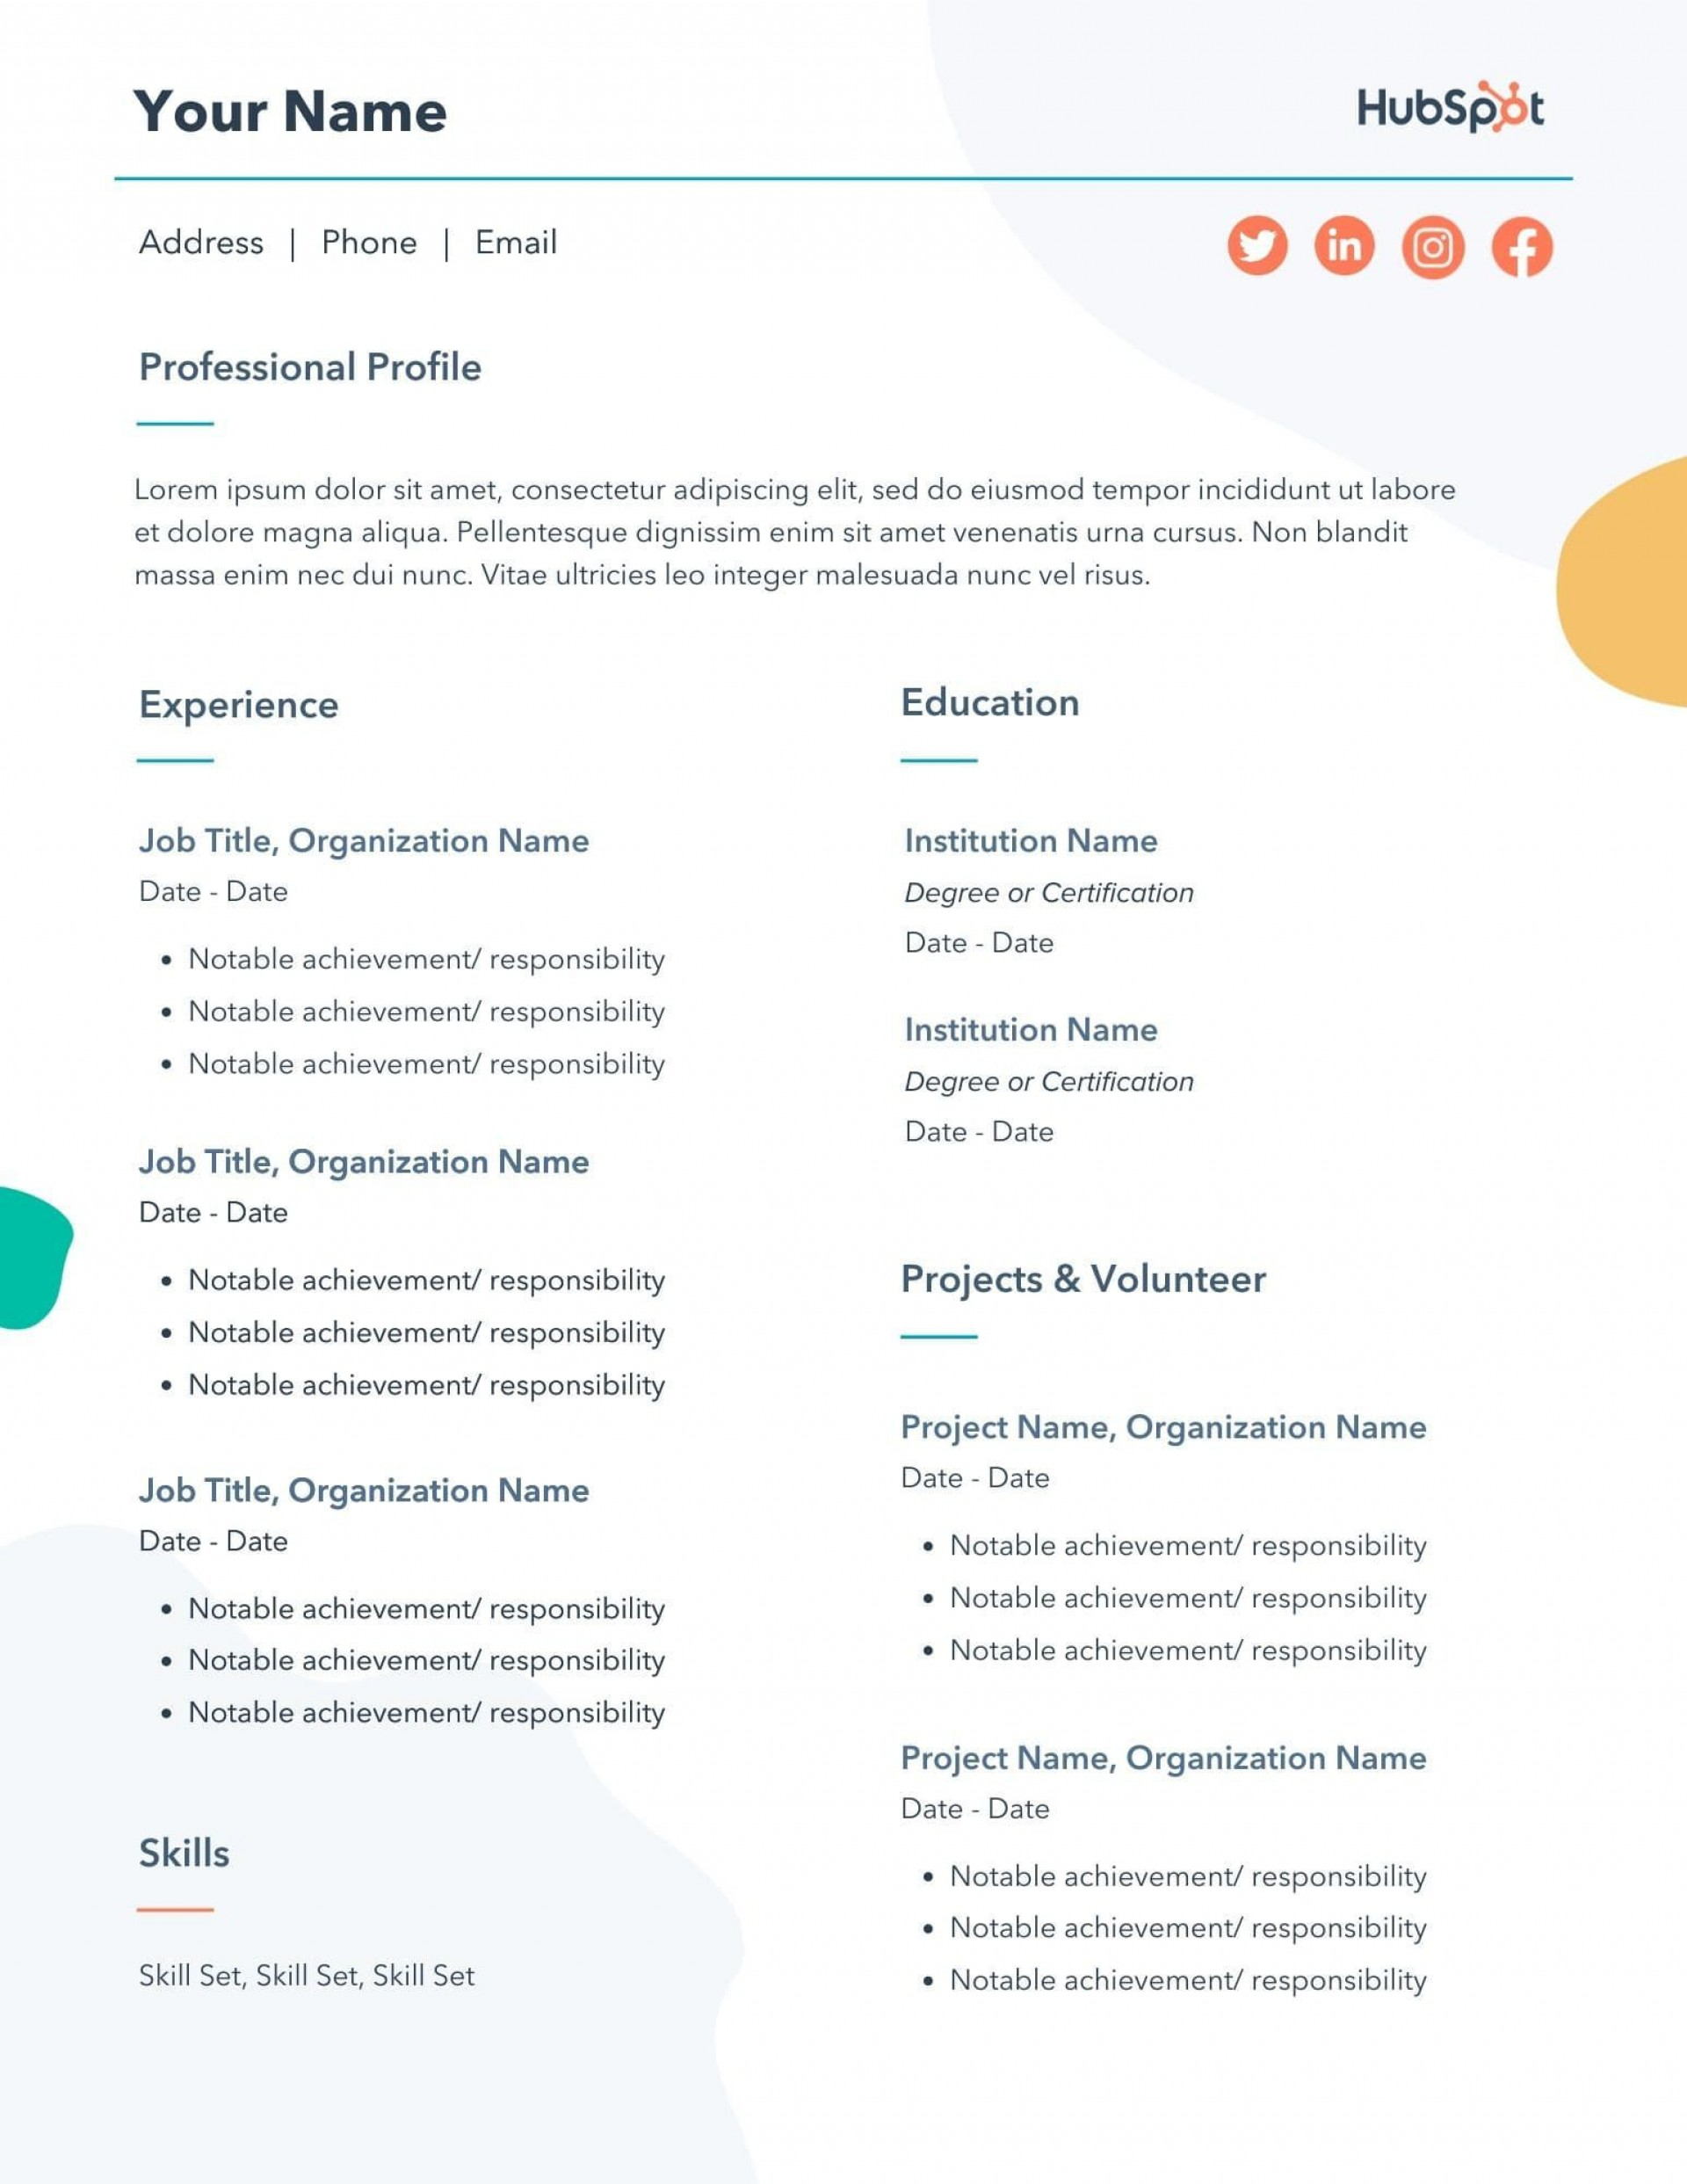 004 Impressive Resume Microsoft Word Template Inspiration  Cv/resume Design Tutorial With Federal Download1920